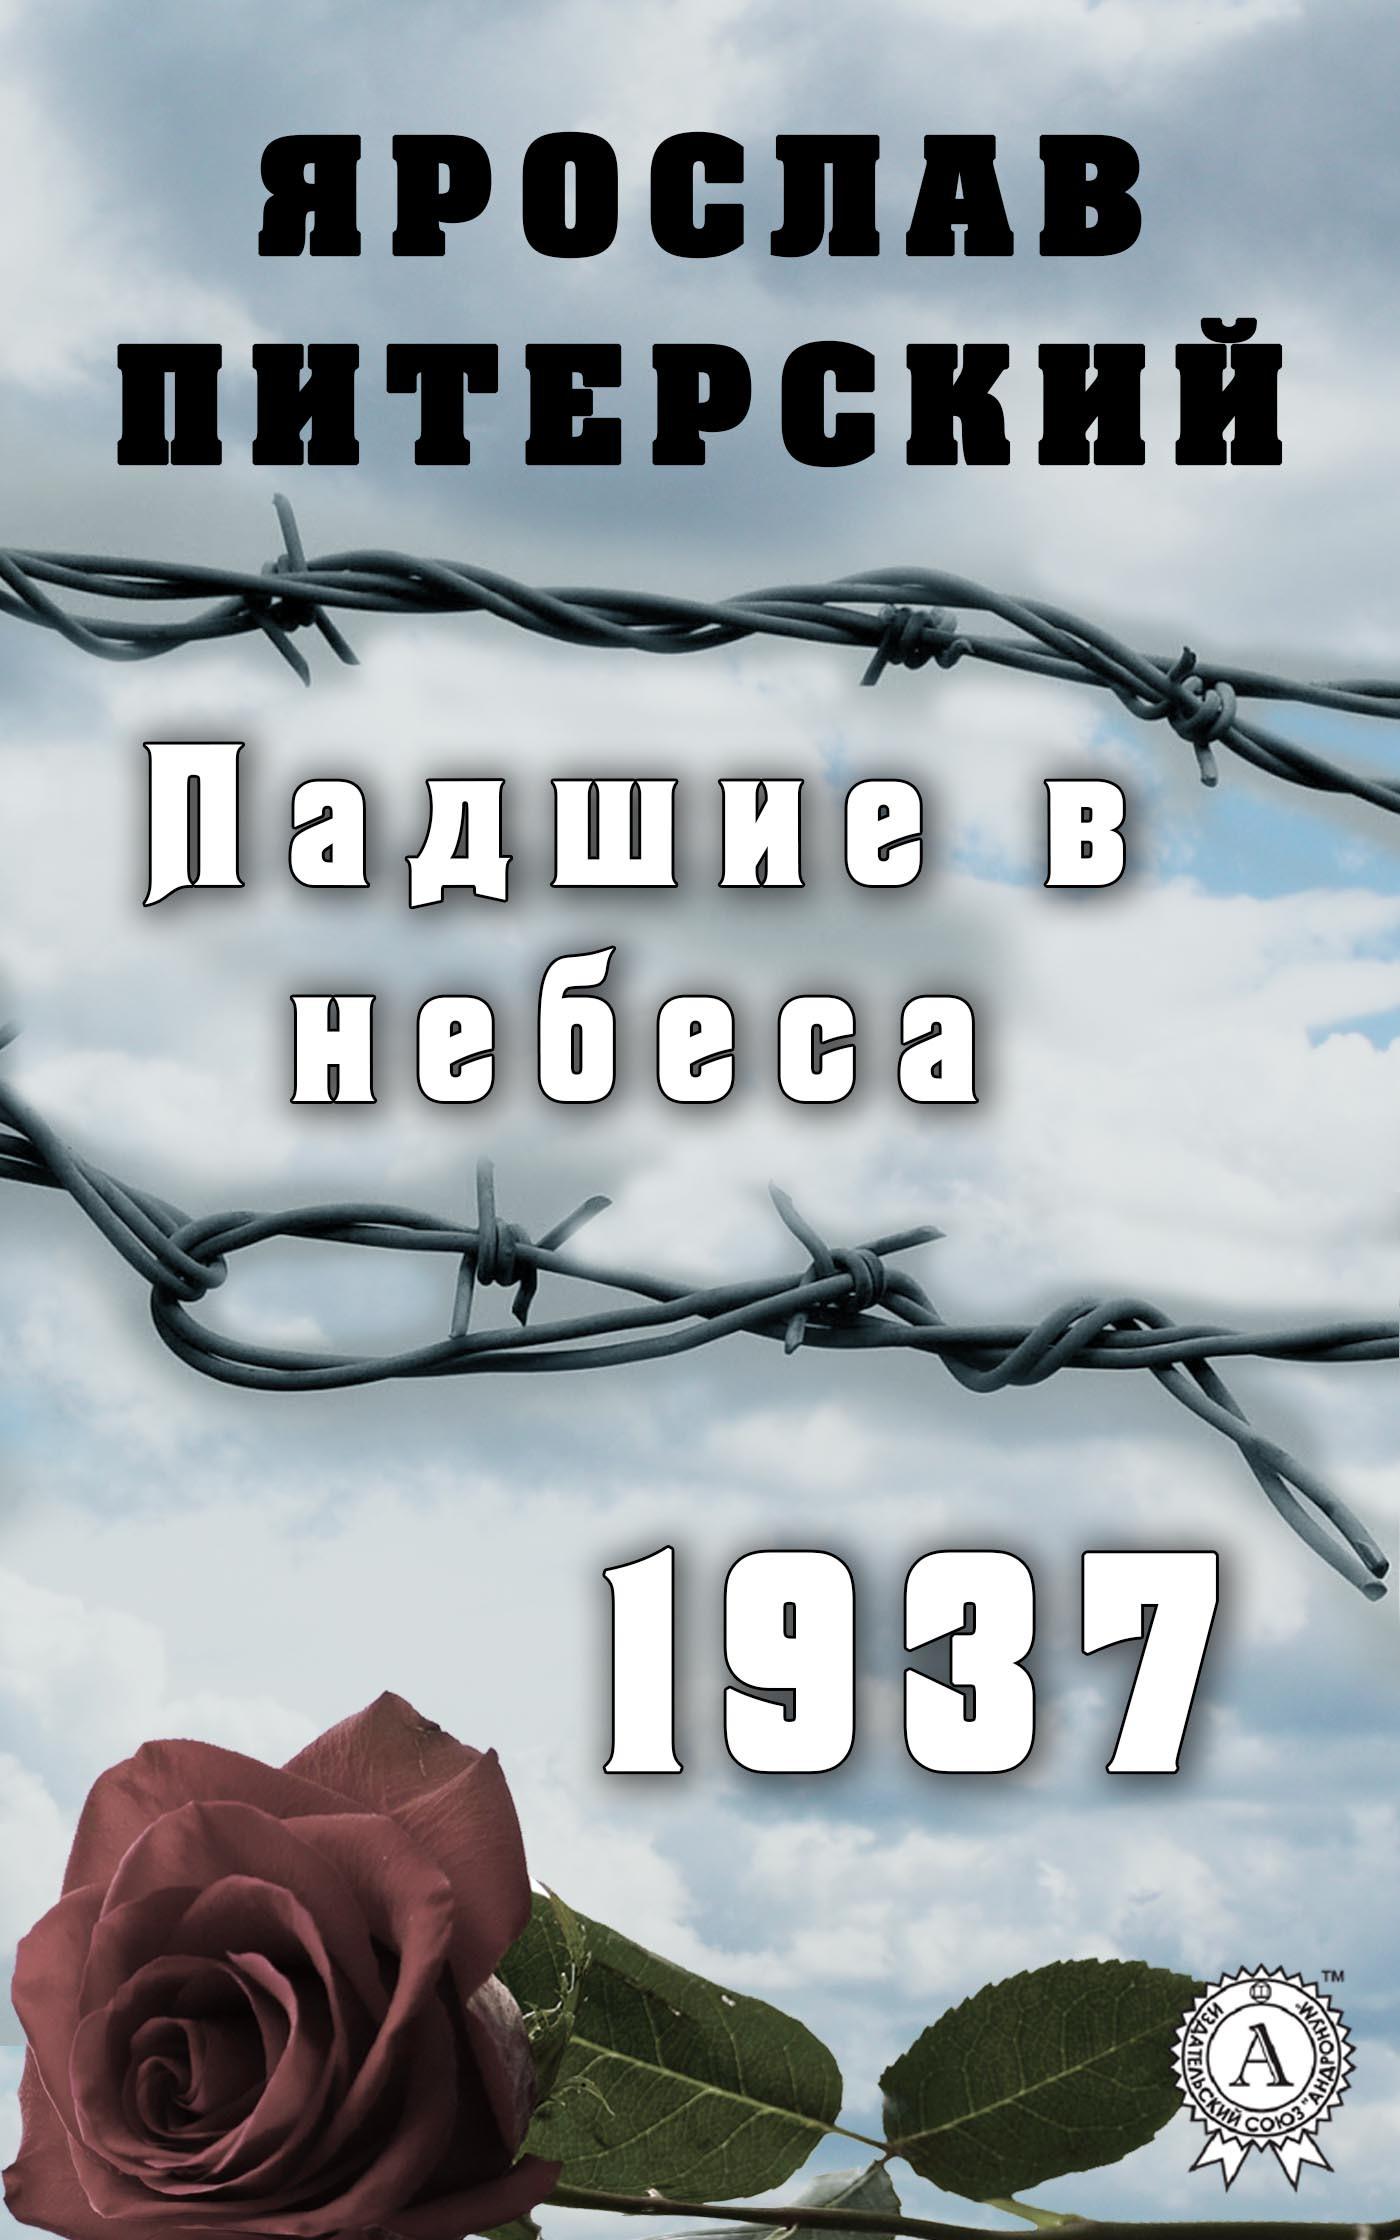 Ярослав Питерский «Падшие в небеса.1937»